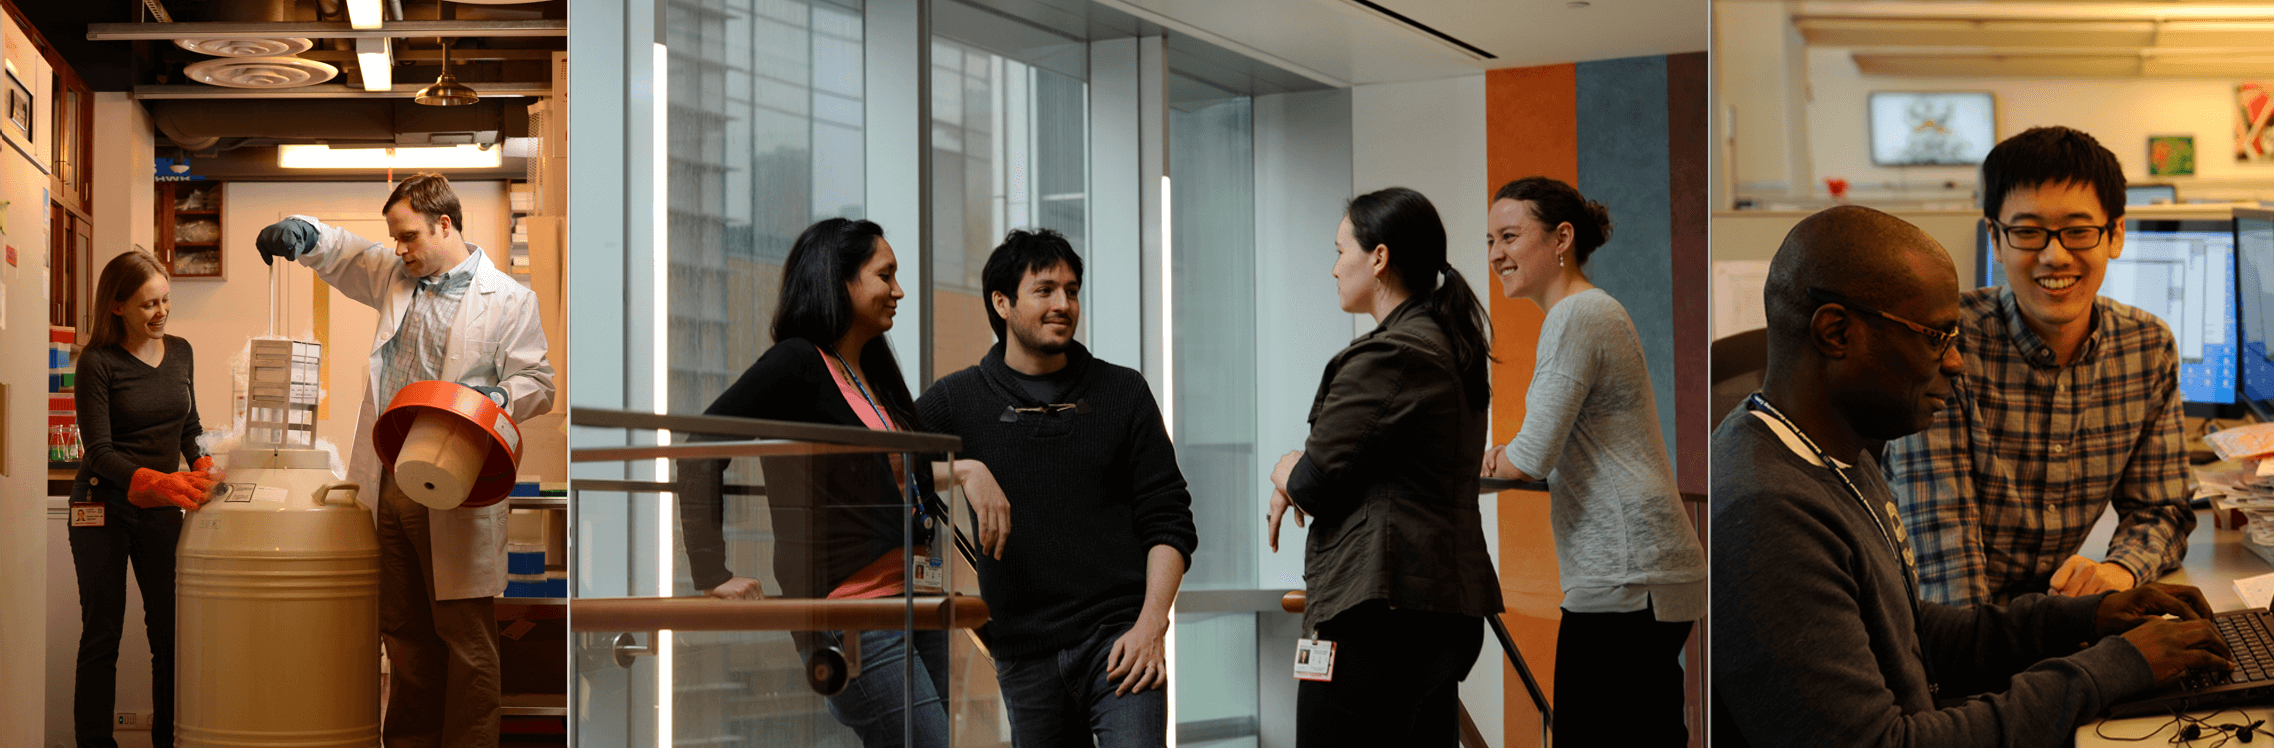 Graduate School of Medical Sciences | Weill Cornell Medicine